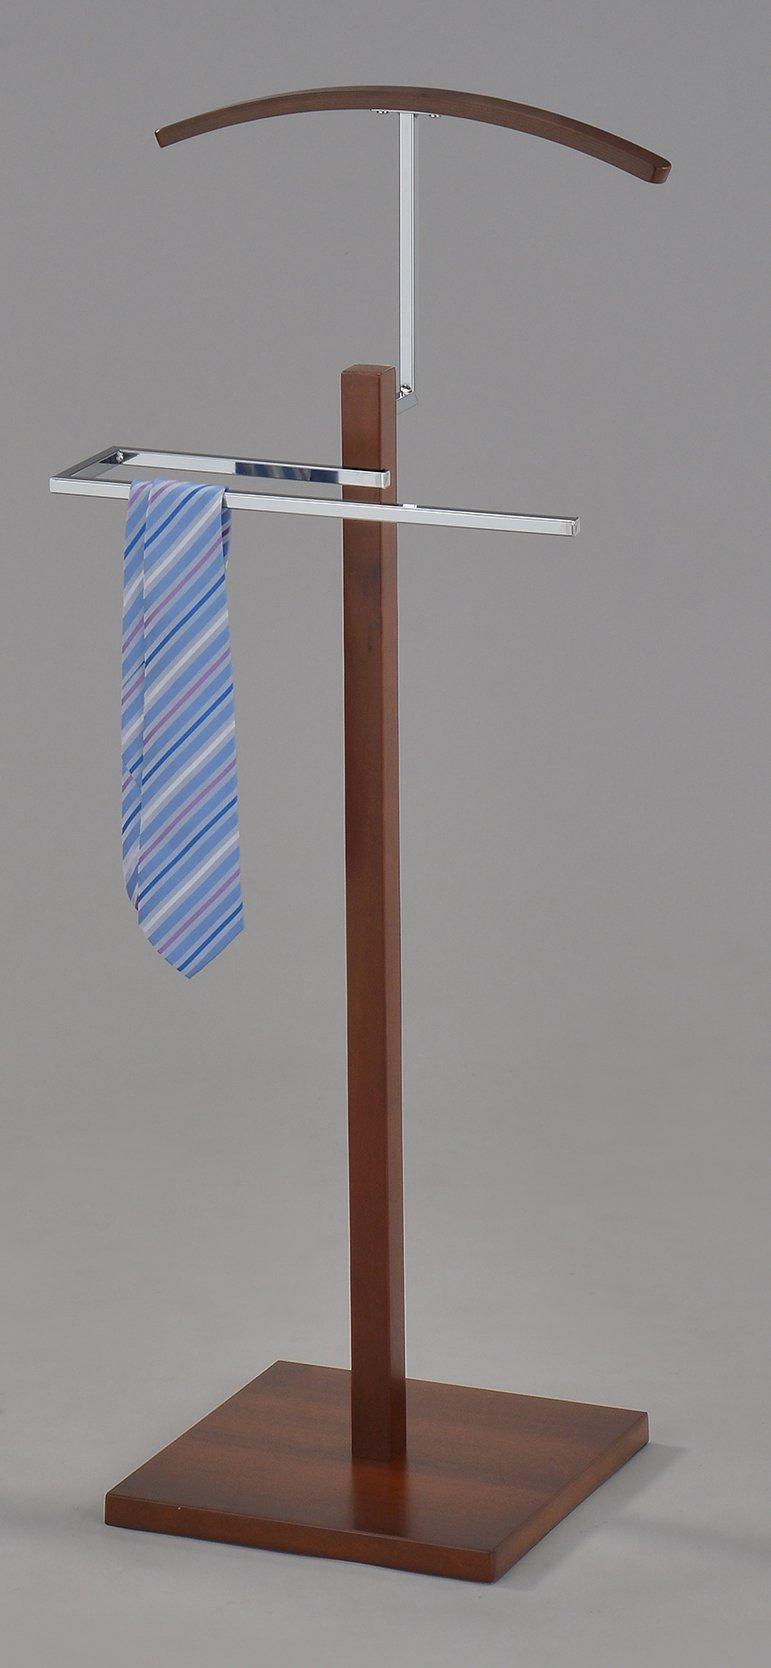 Kings Brand Furniture Chrome Suit Rack Valet Stand (Walnut)